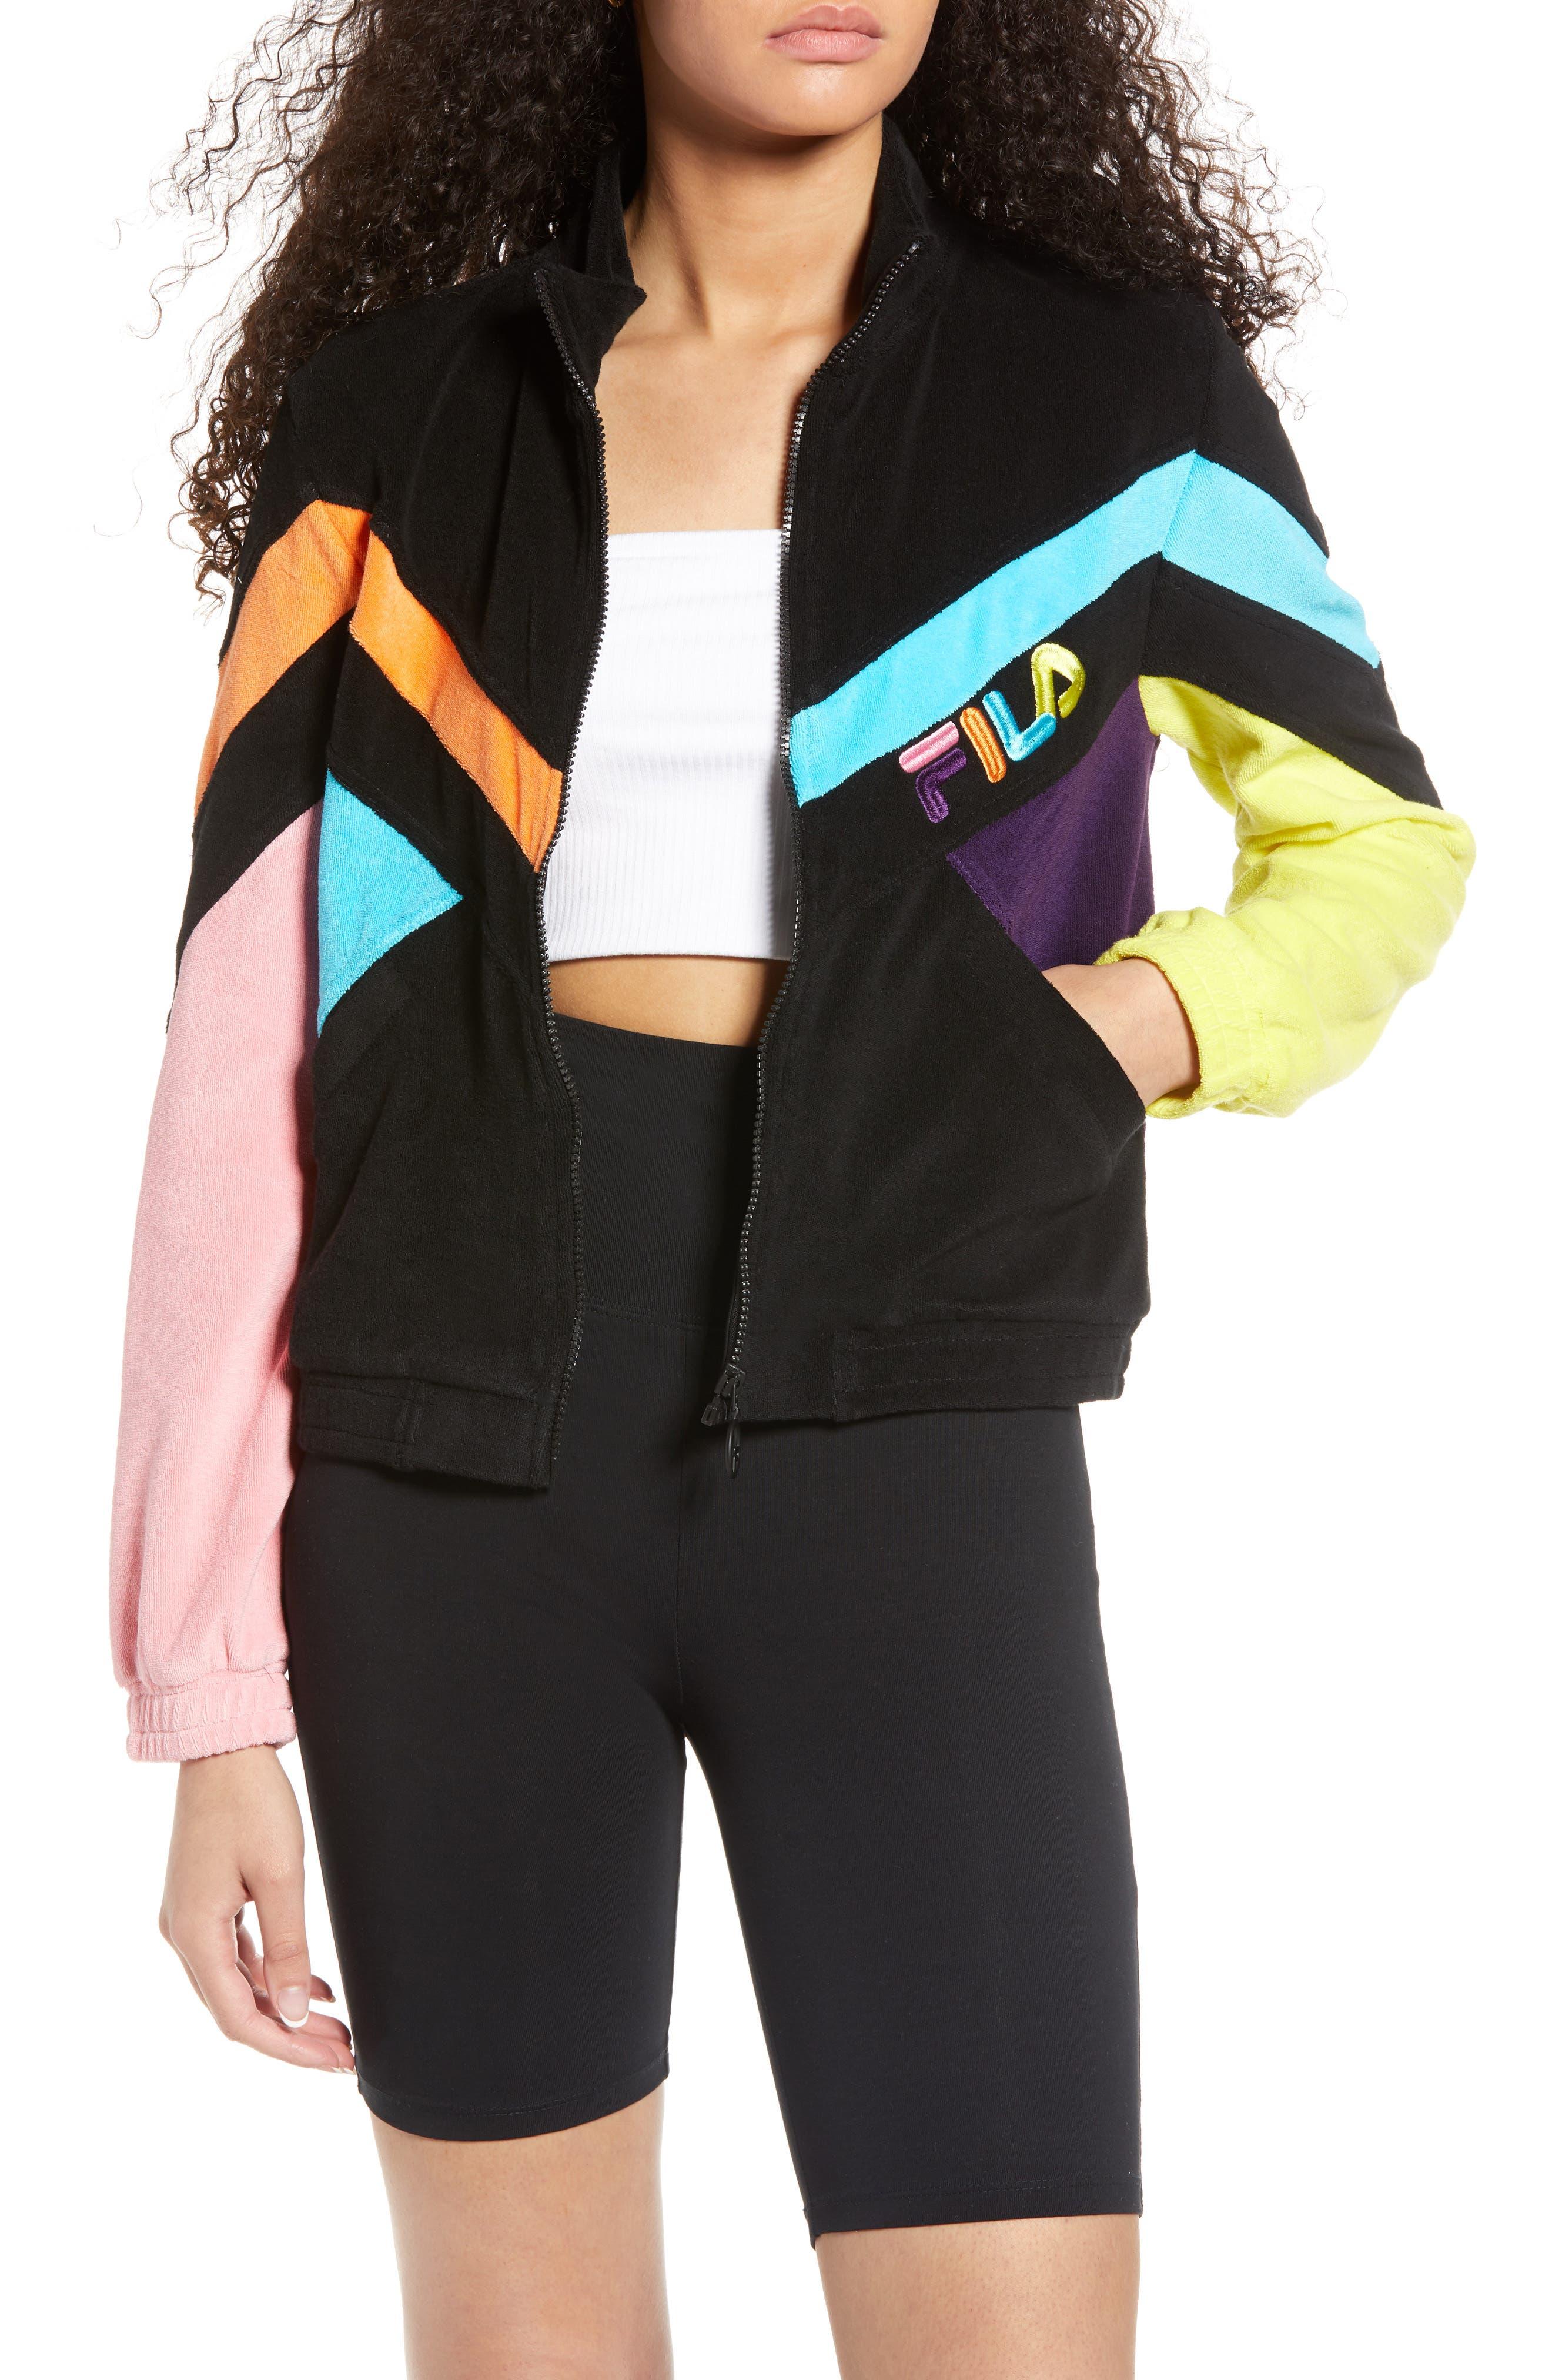 70s Workout Clothes | 80s Tracksuits, Running Shorts, Leotards Womens Fila Hadley Colorblock Velour Crop Jacket $68.00 AT vintagedancer.com